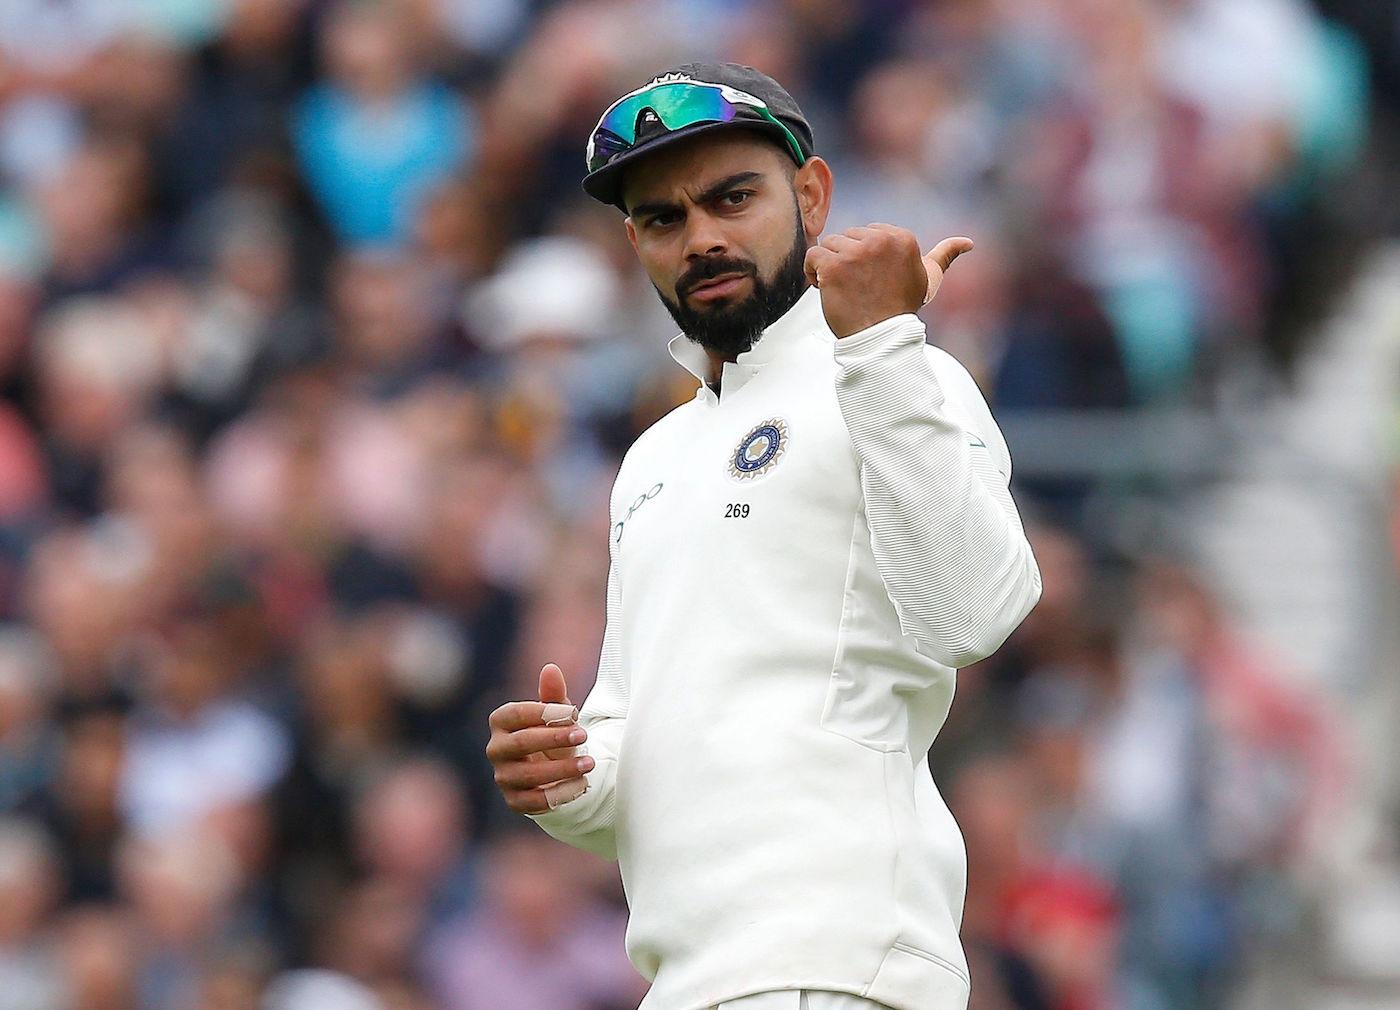 At Times Lack Of Experience Shows In Virat Kohli's Captaincy, Says Sunil Gavaskar